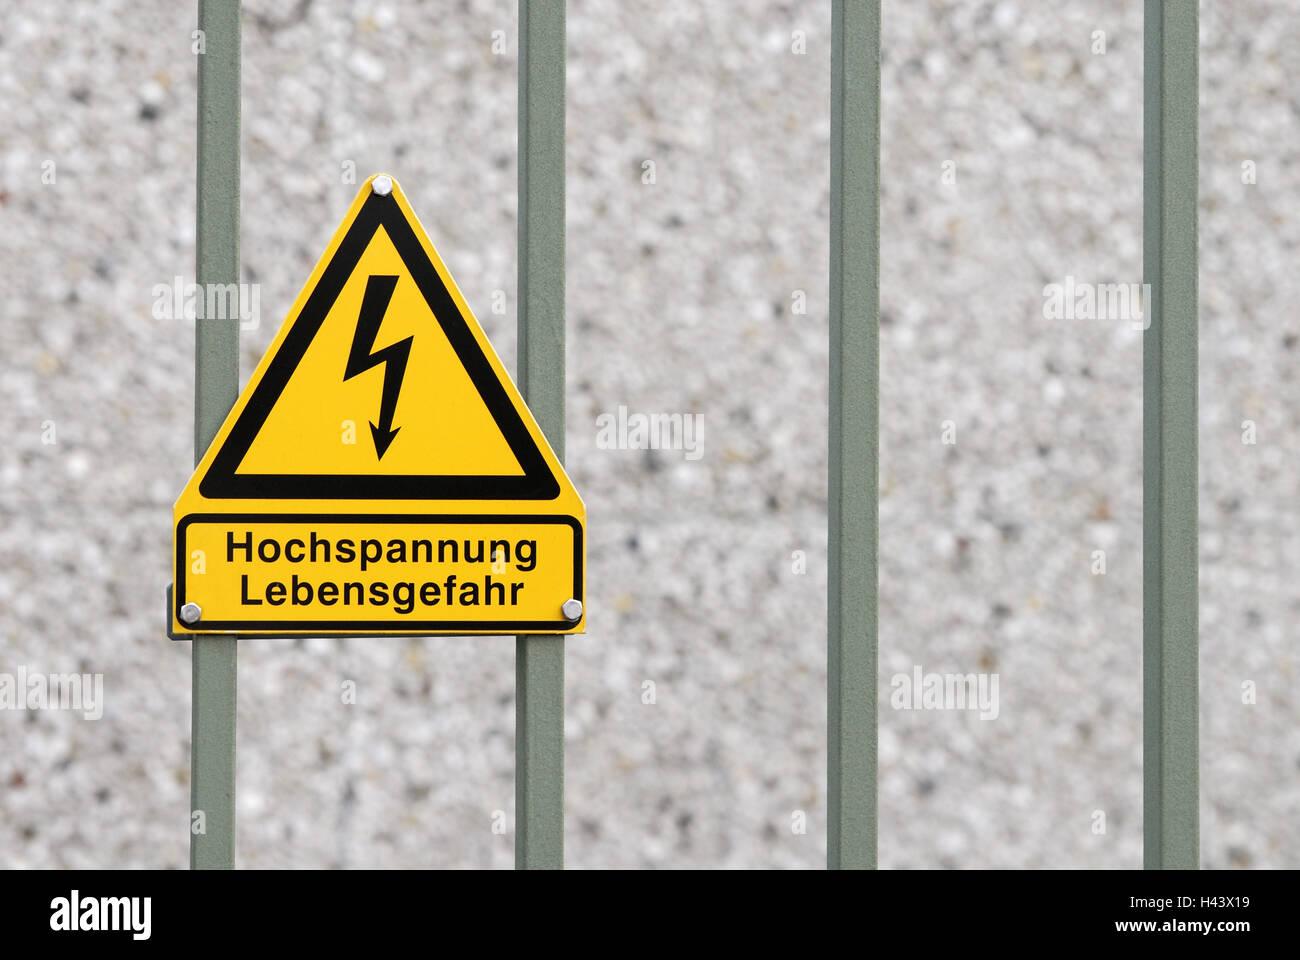 High voltage, sign, mortal danger, goal, defensive wall, - Stock Image